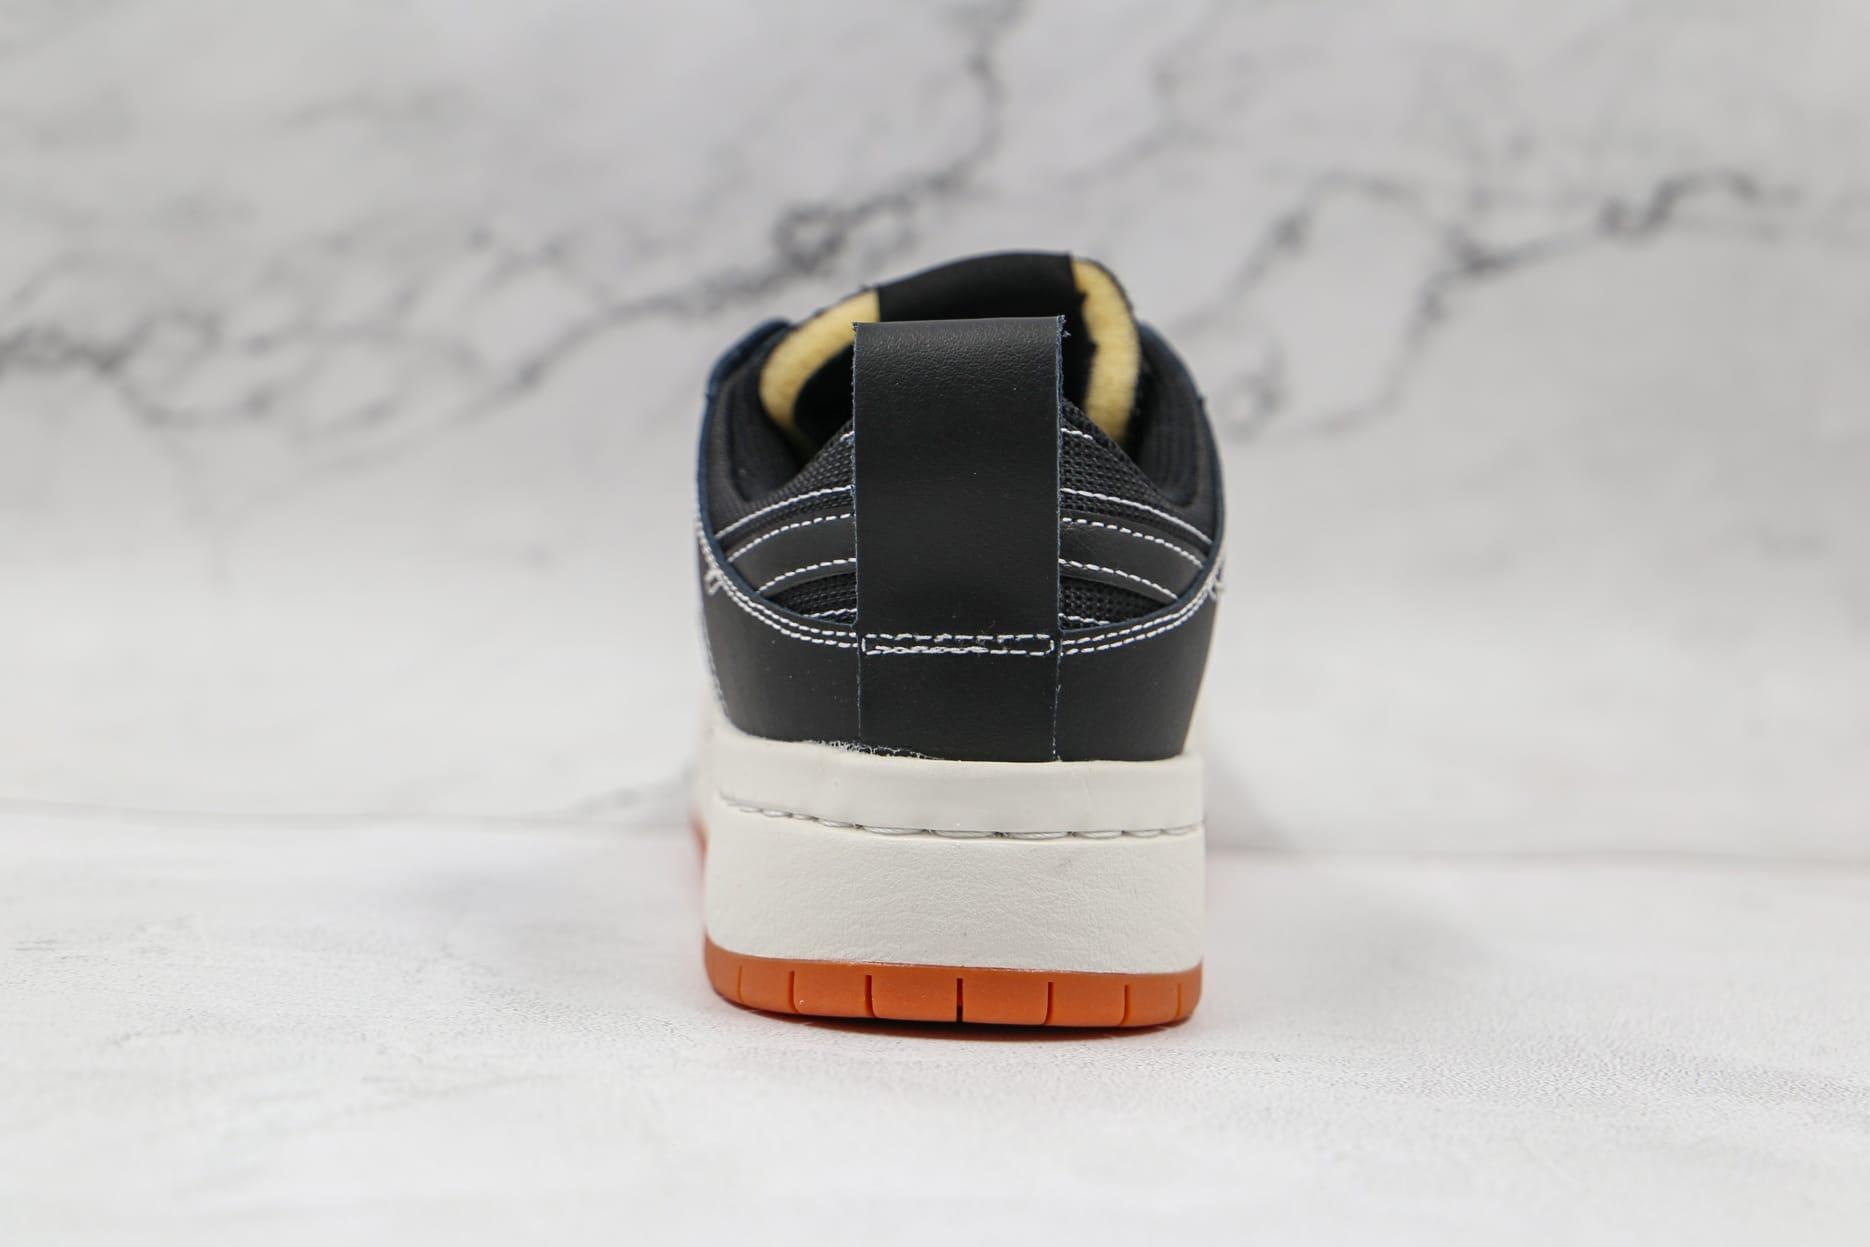 Nike Dunk Low Disrupt Black Gum W 2